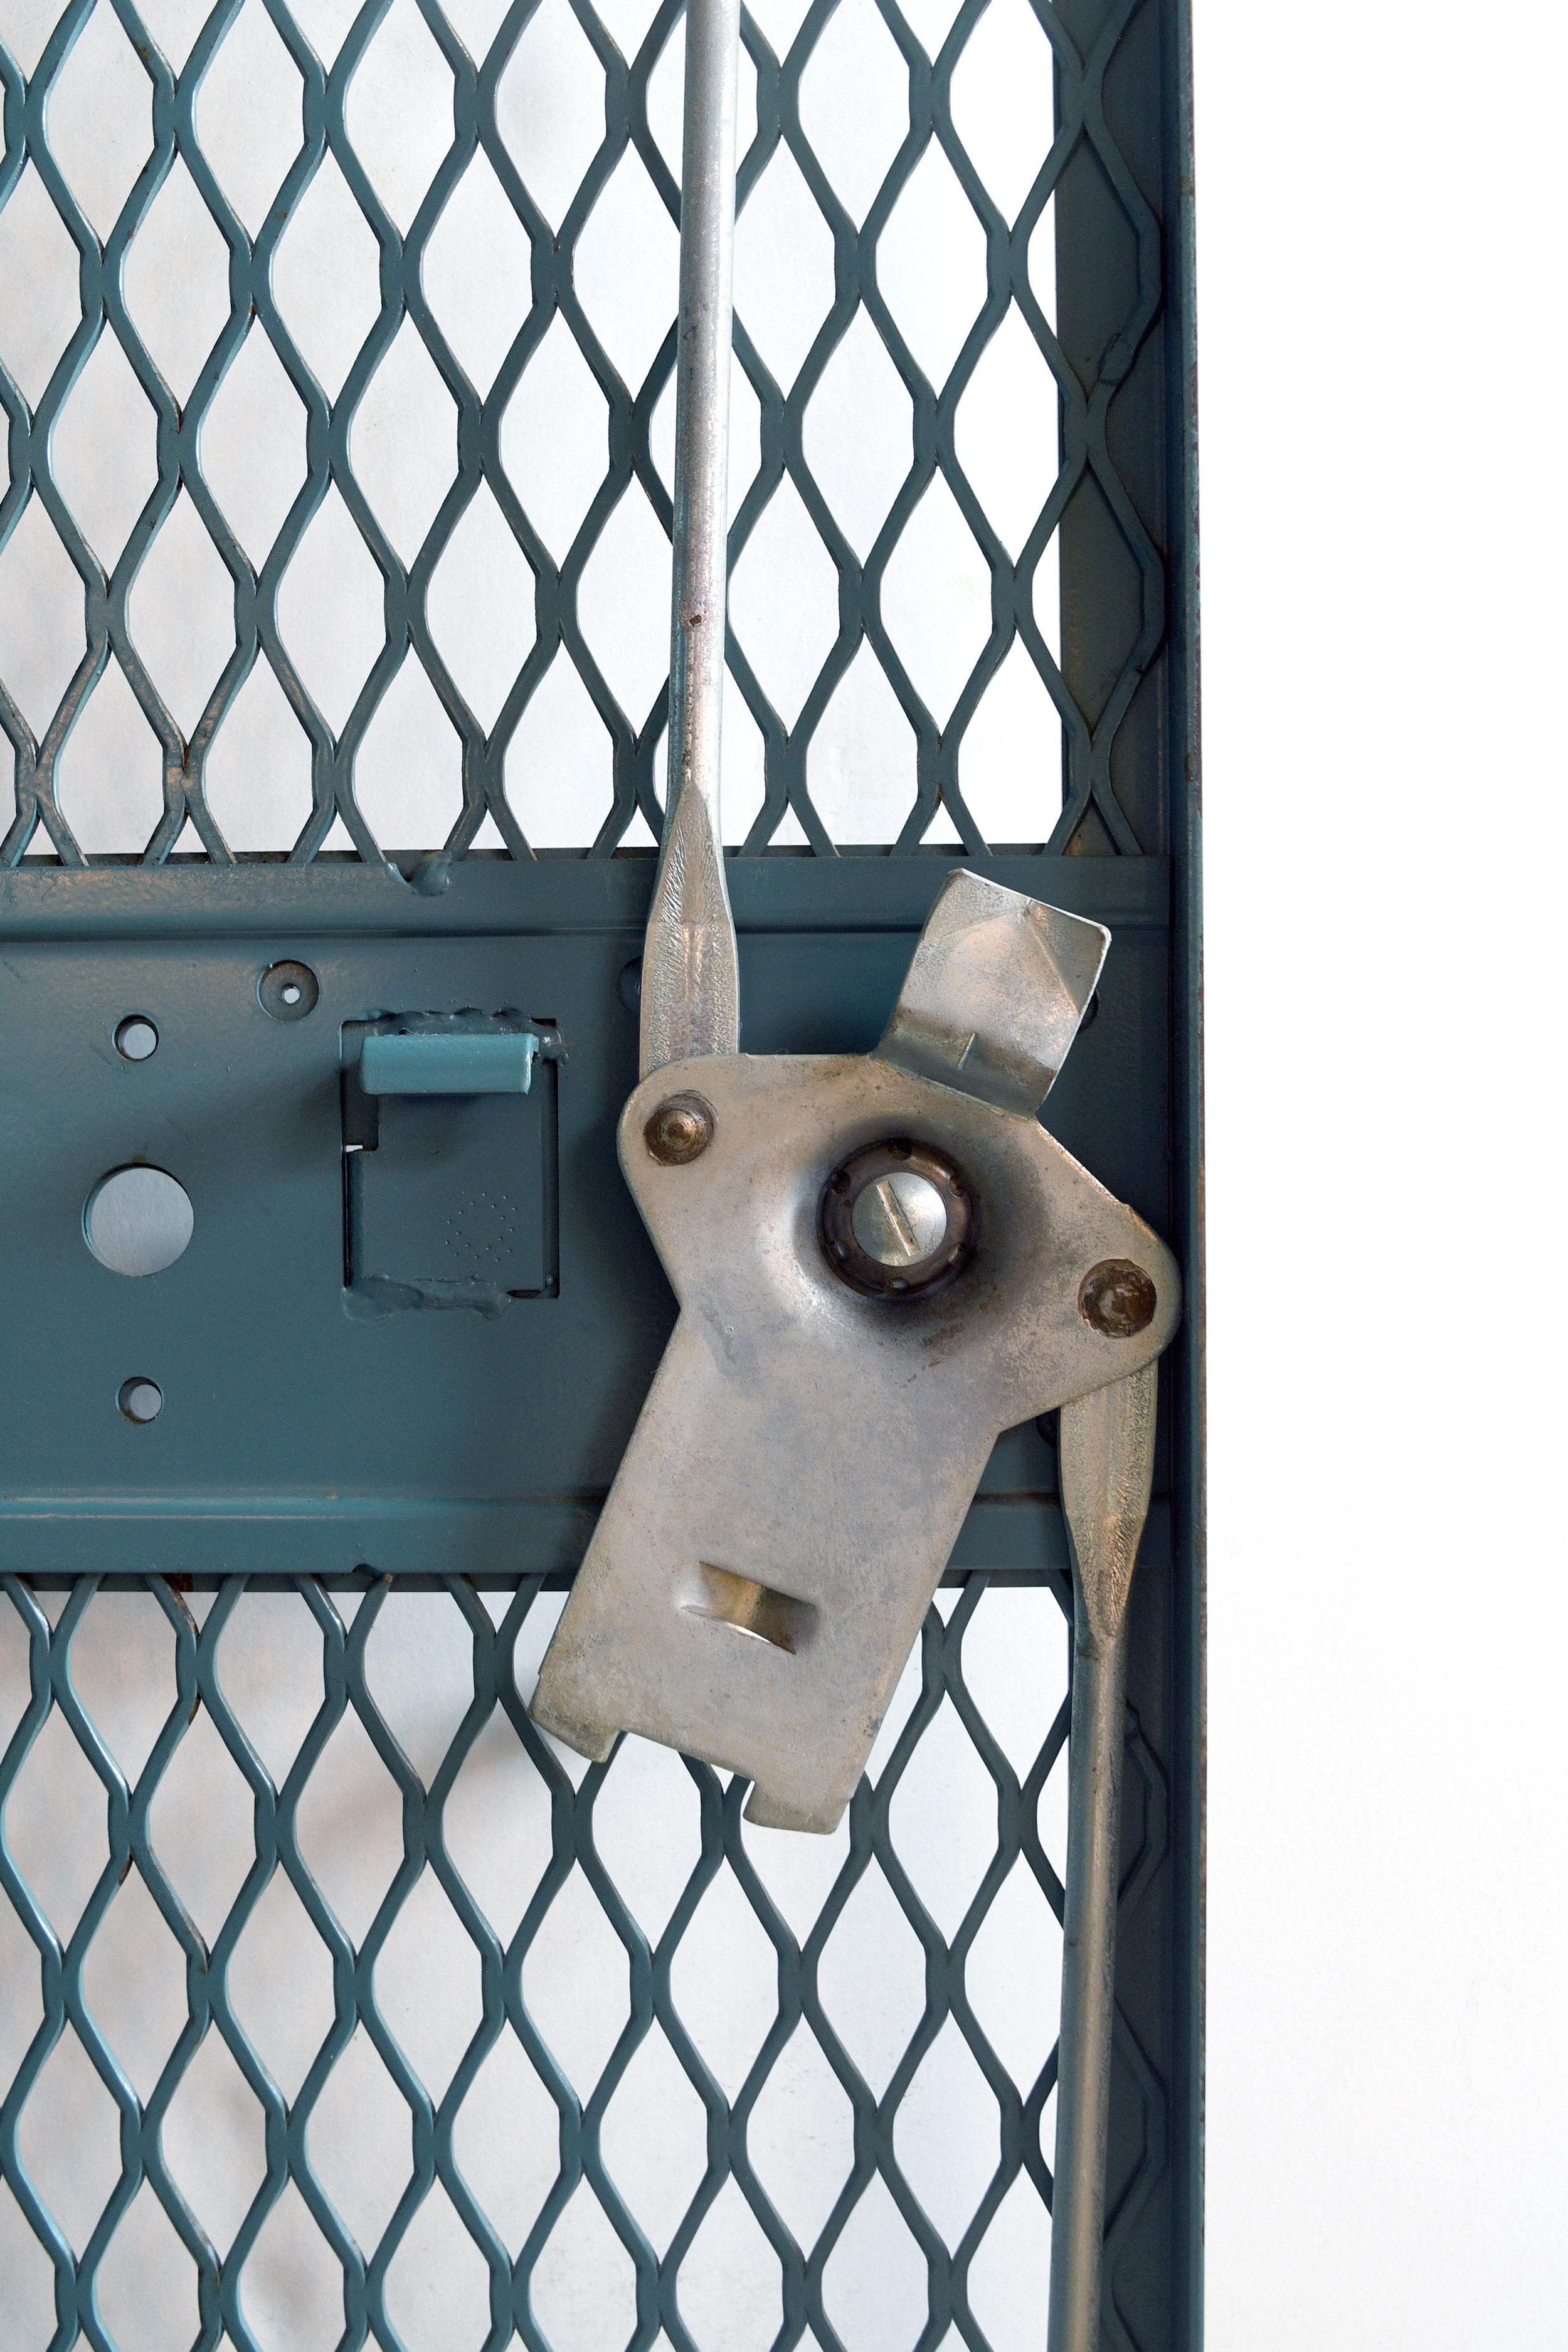 48325-inside-lock.jpg